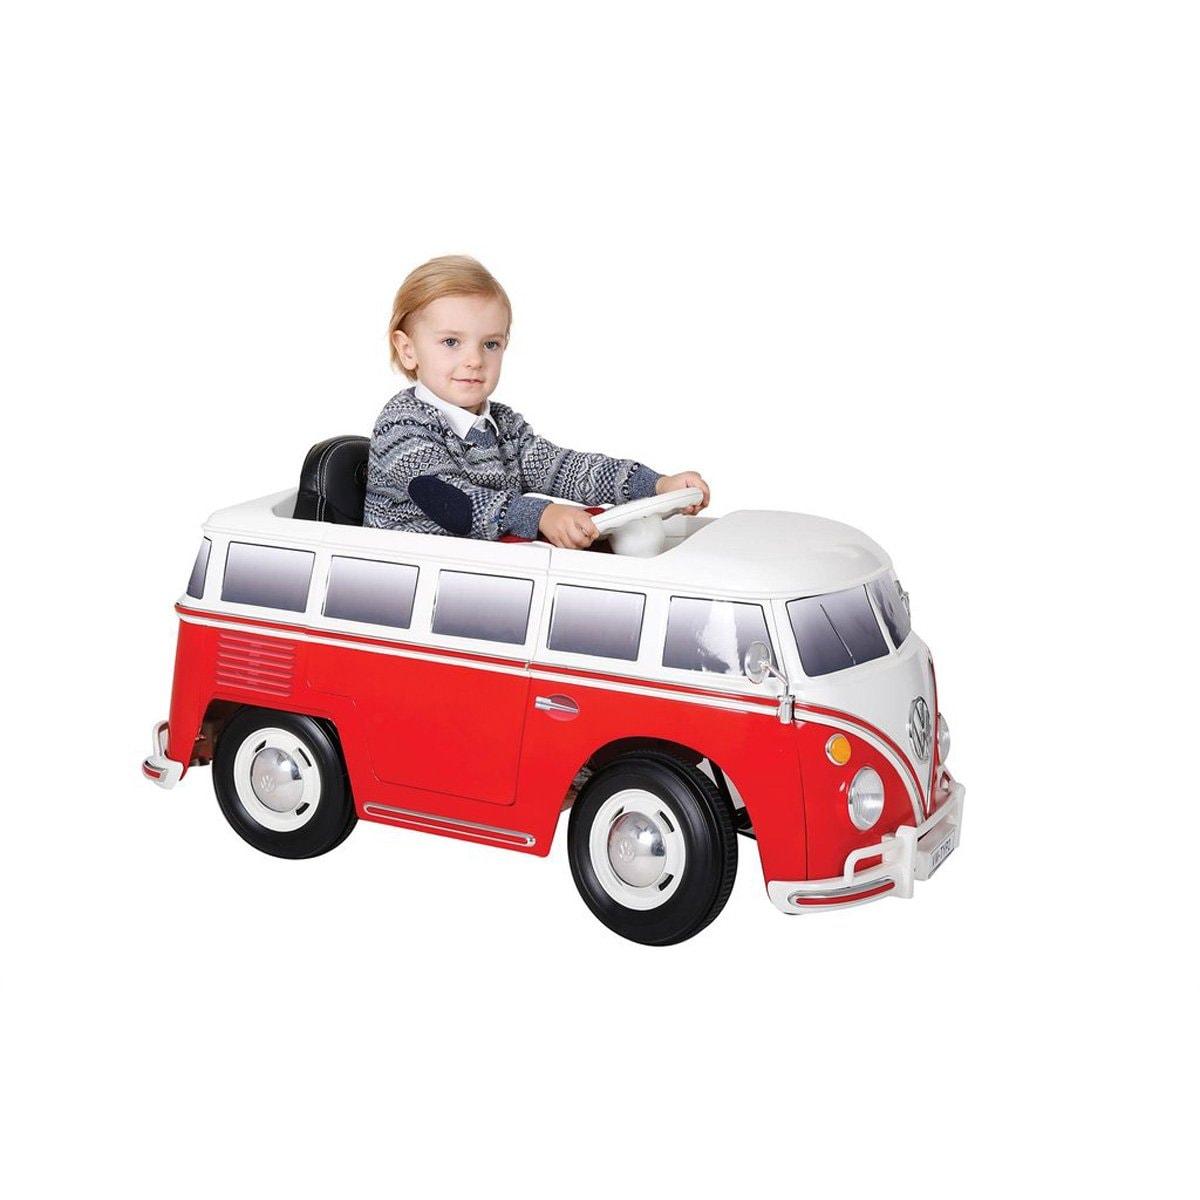 Montable Vw Minibus Red Prinsel